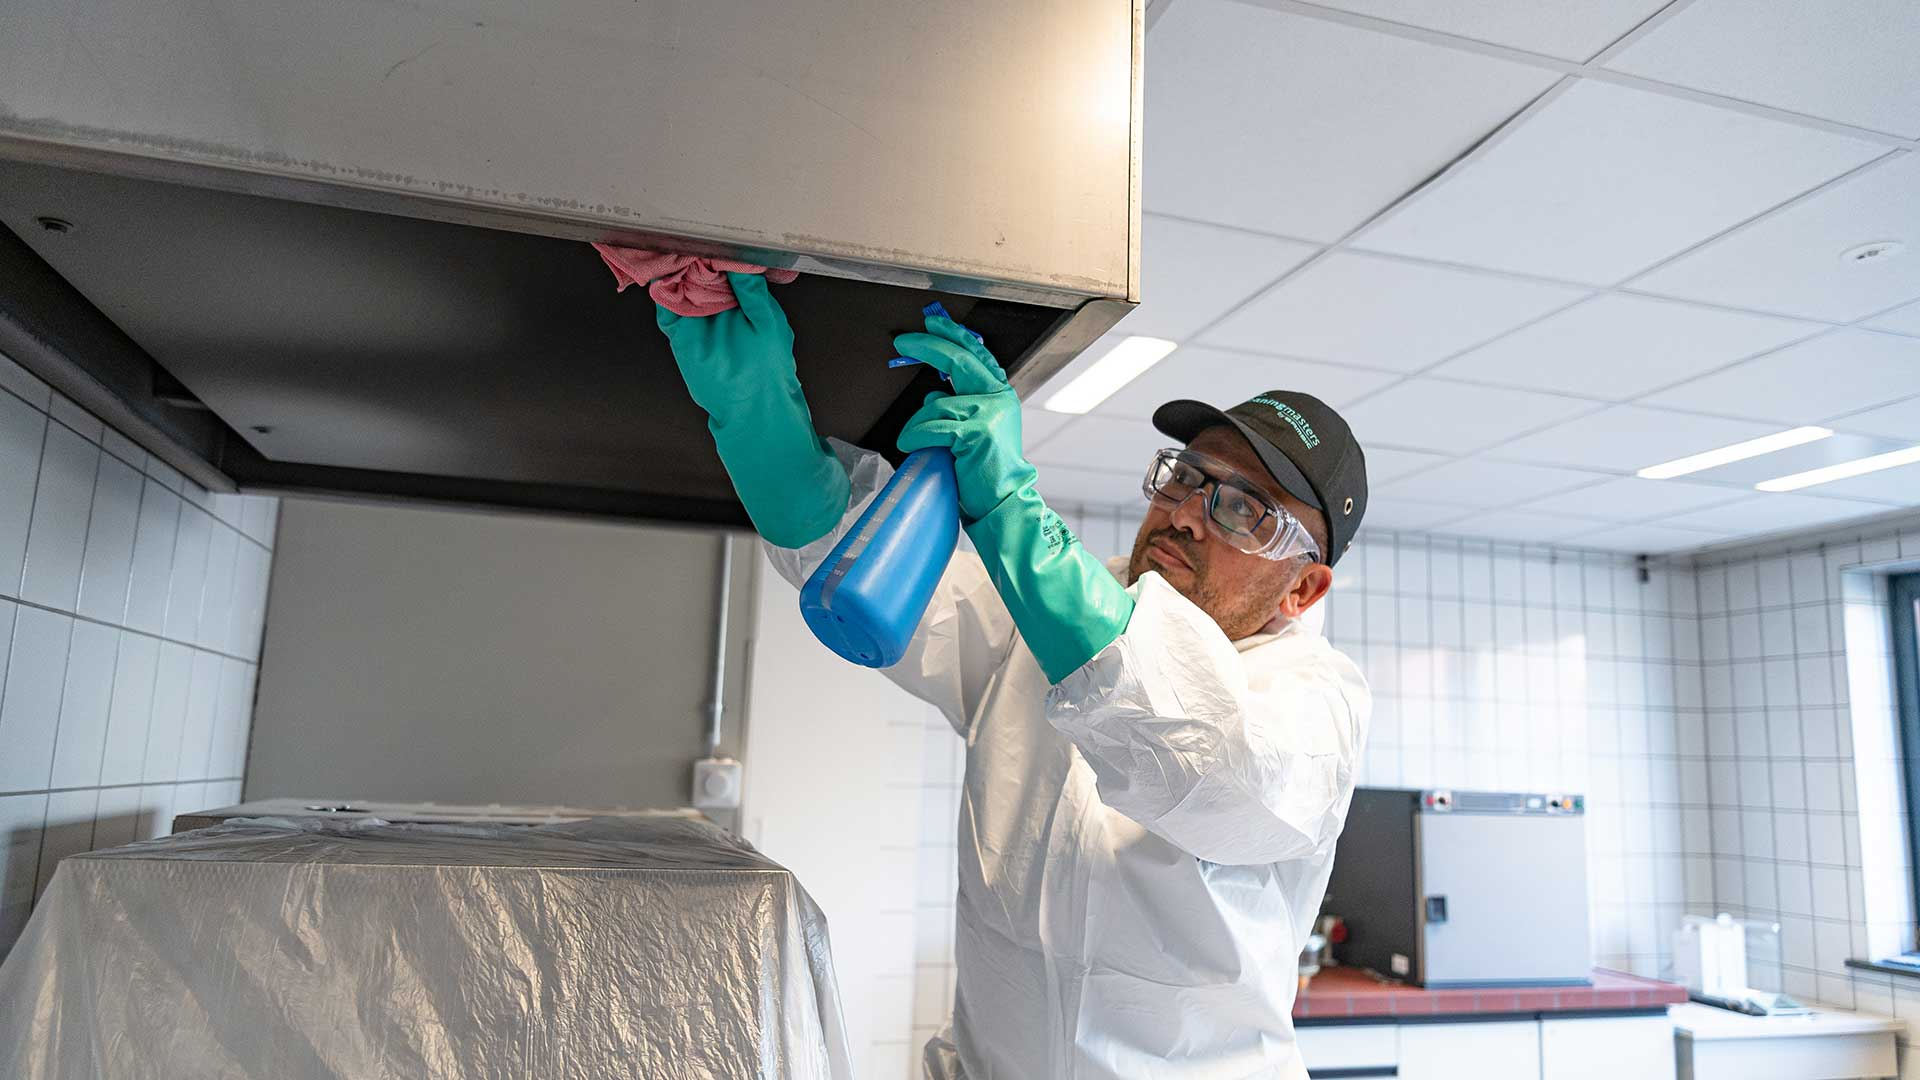 Gespecialiseerde reiniging - Cleaning Masters